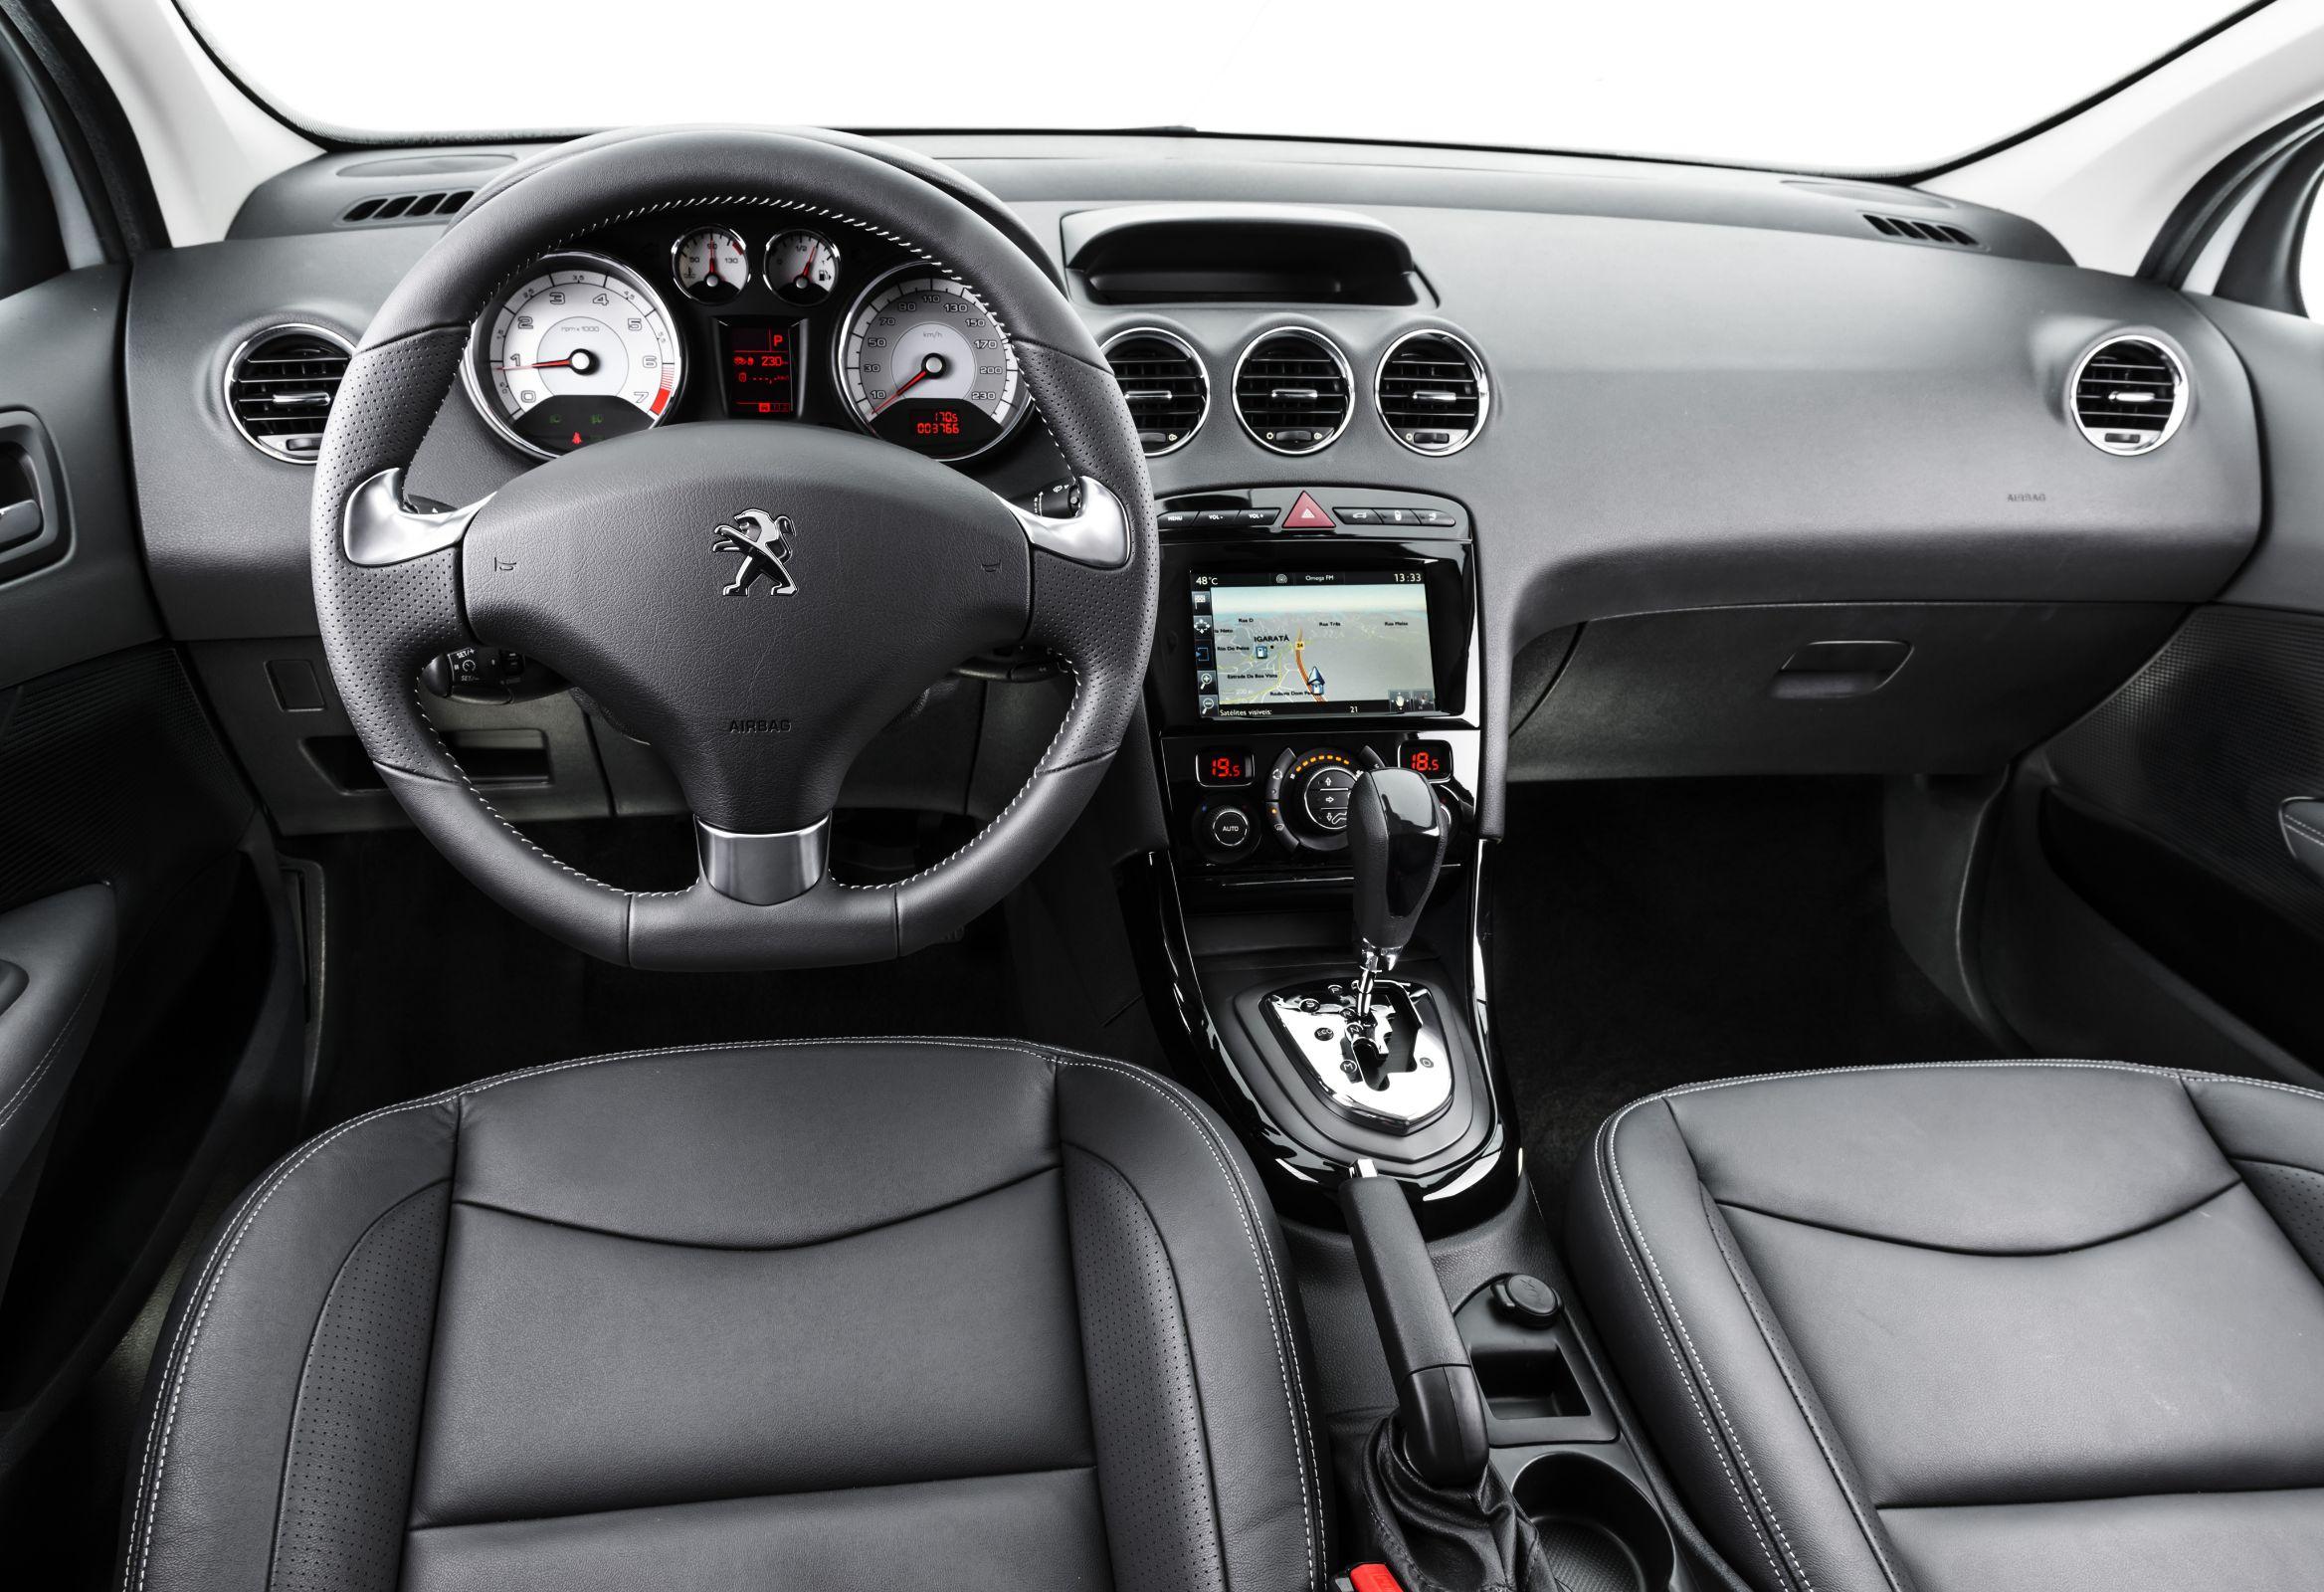 Peugeot 408 Griffe 0 km x Jetta 2016 Highline